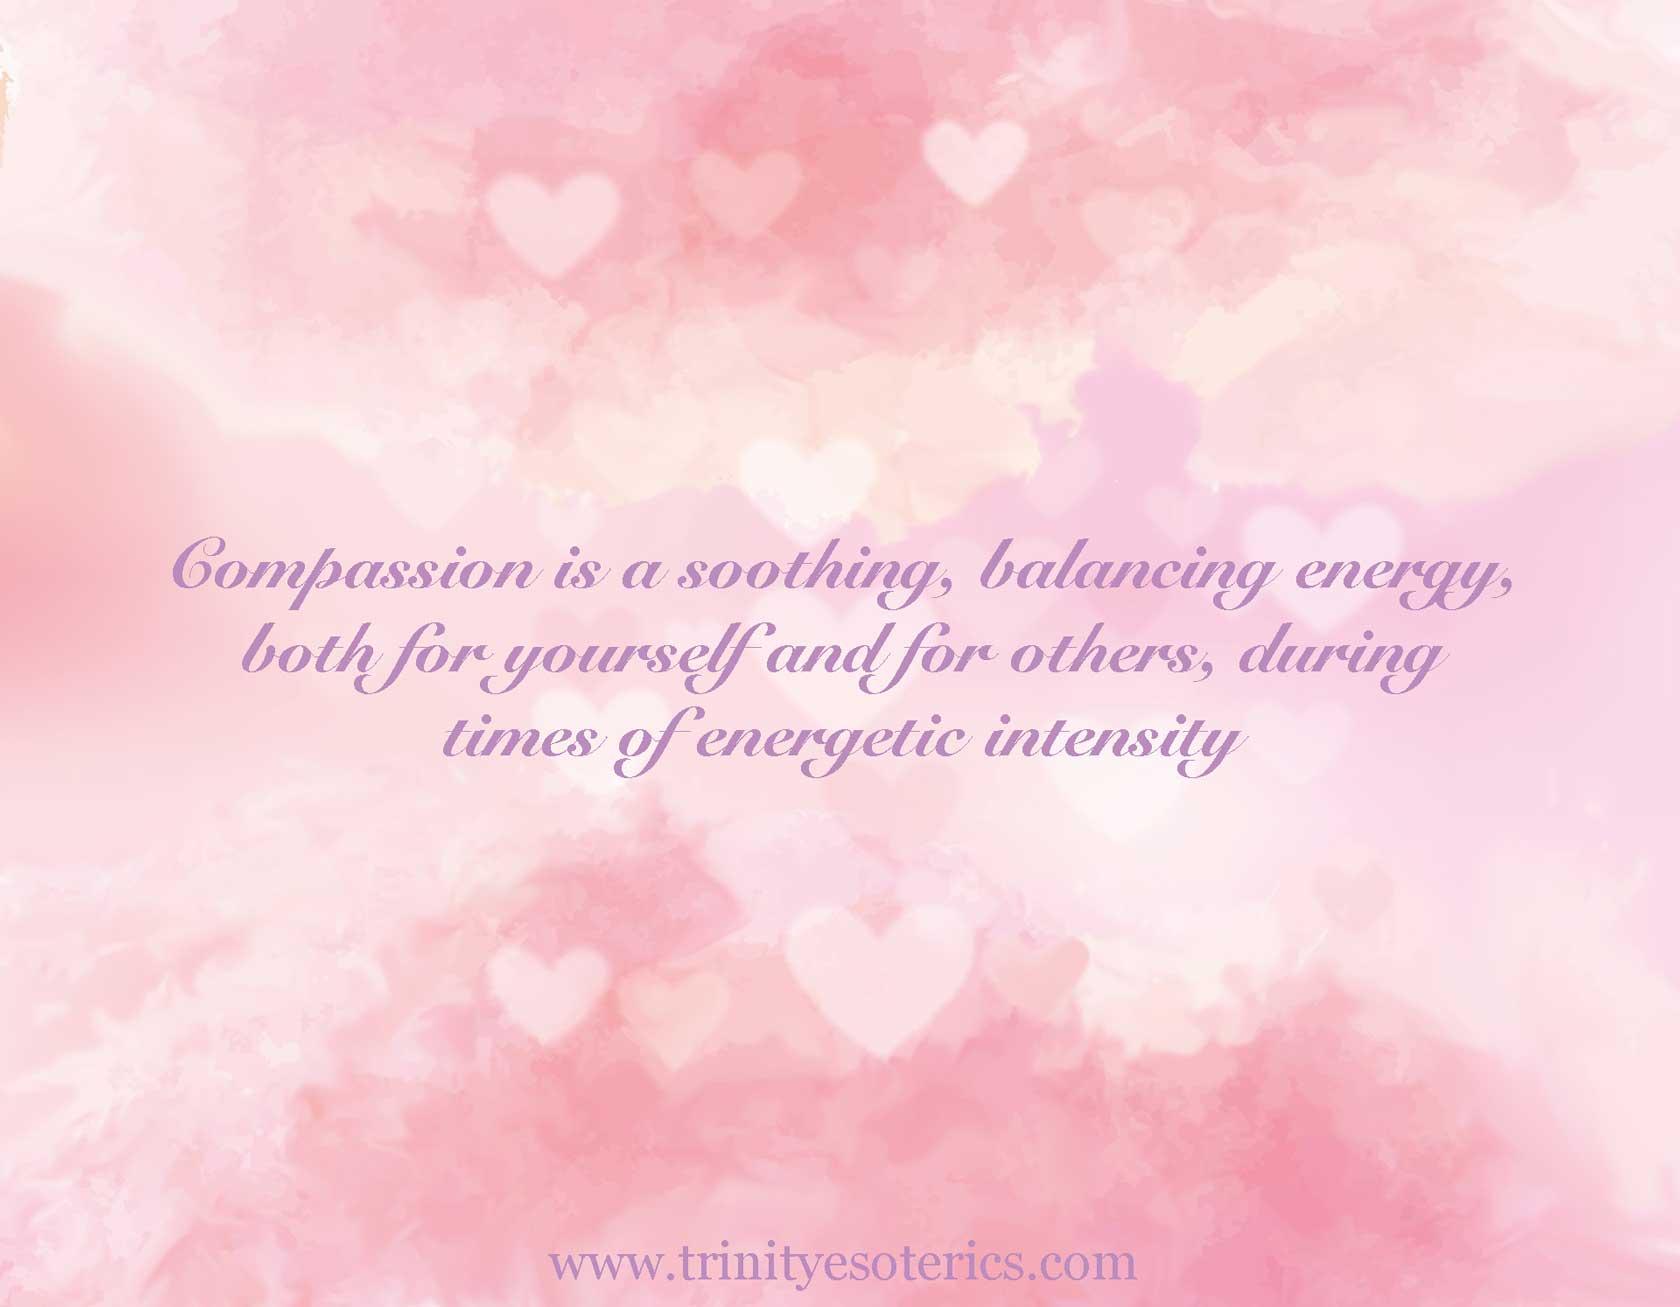 pink background trinity esoterics